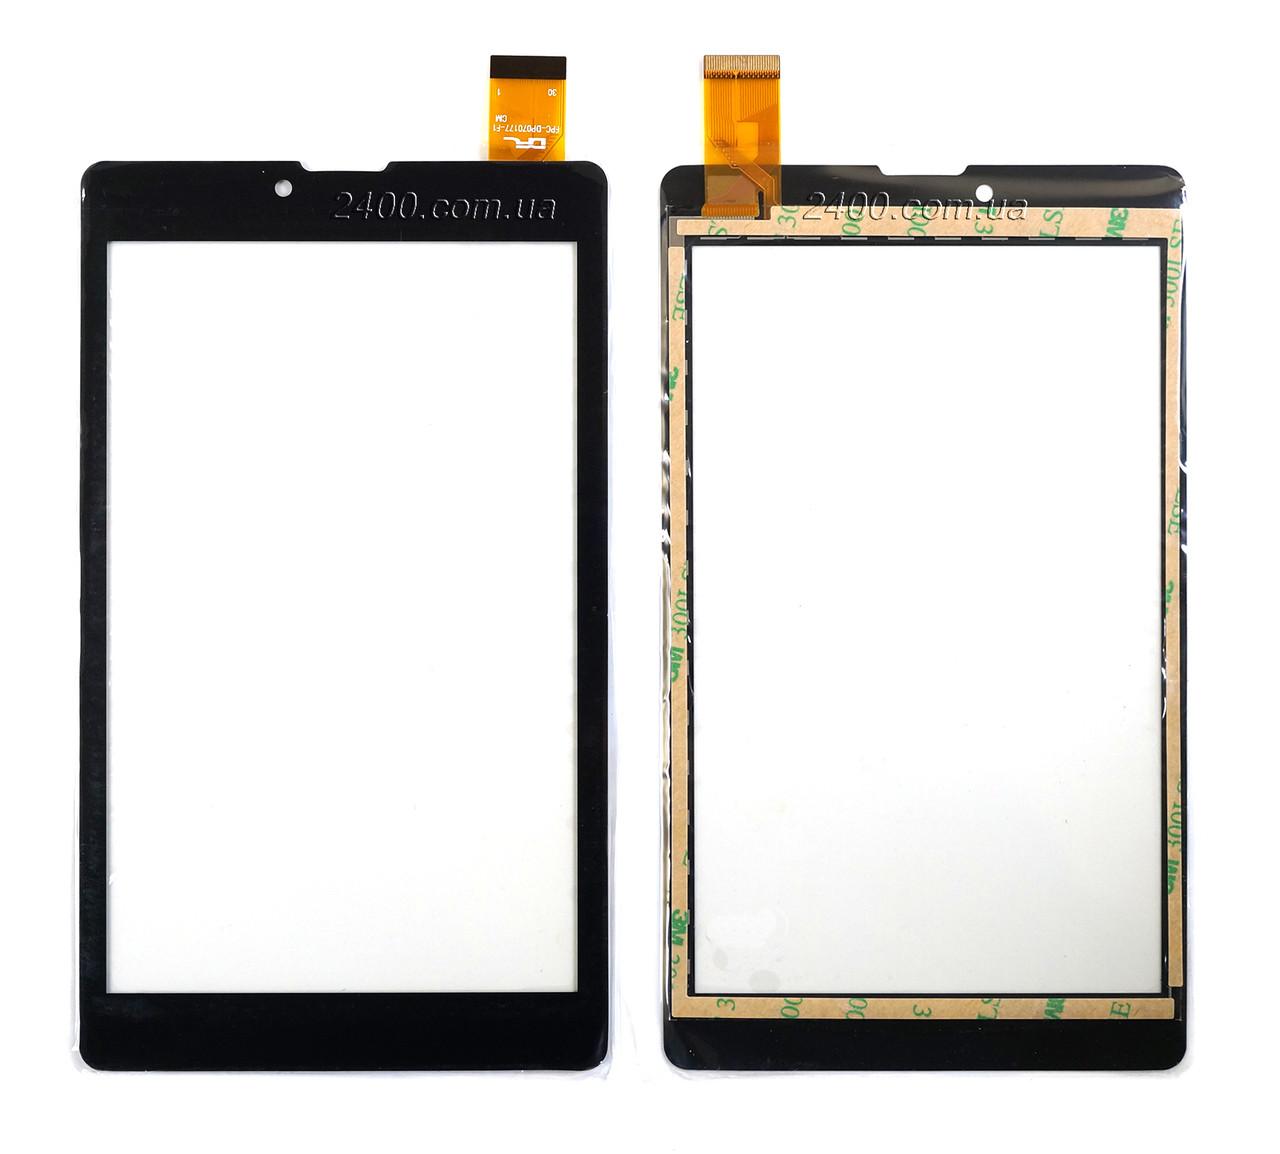 Сенсор, тачскрин RoverPad Pro S7 3G (черный) 30pin 184*106 мм, FPC-DP070177-F1